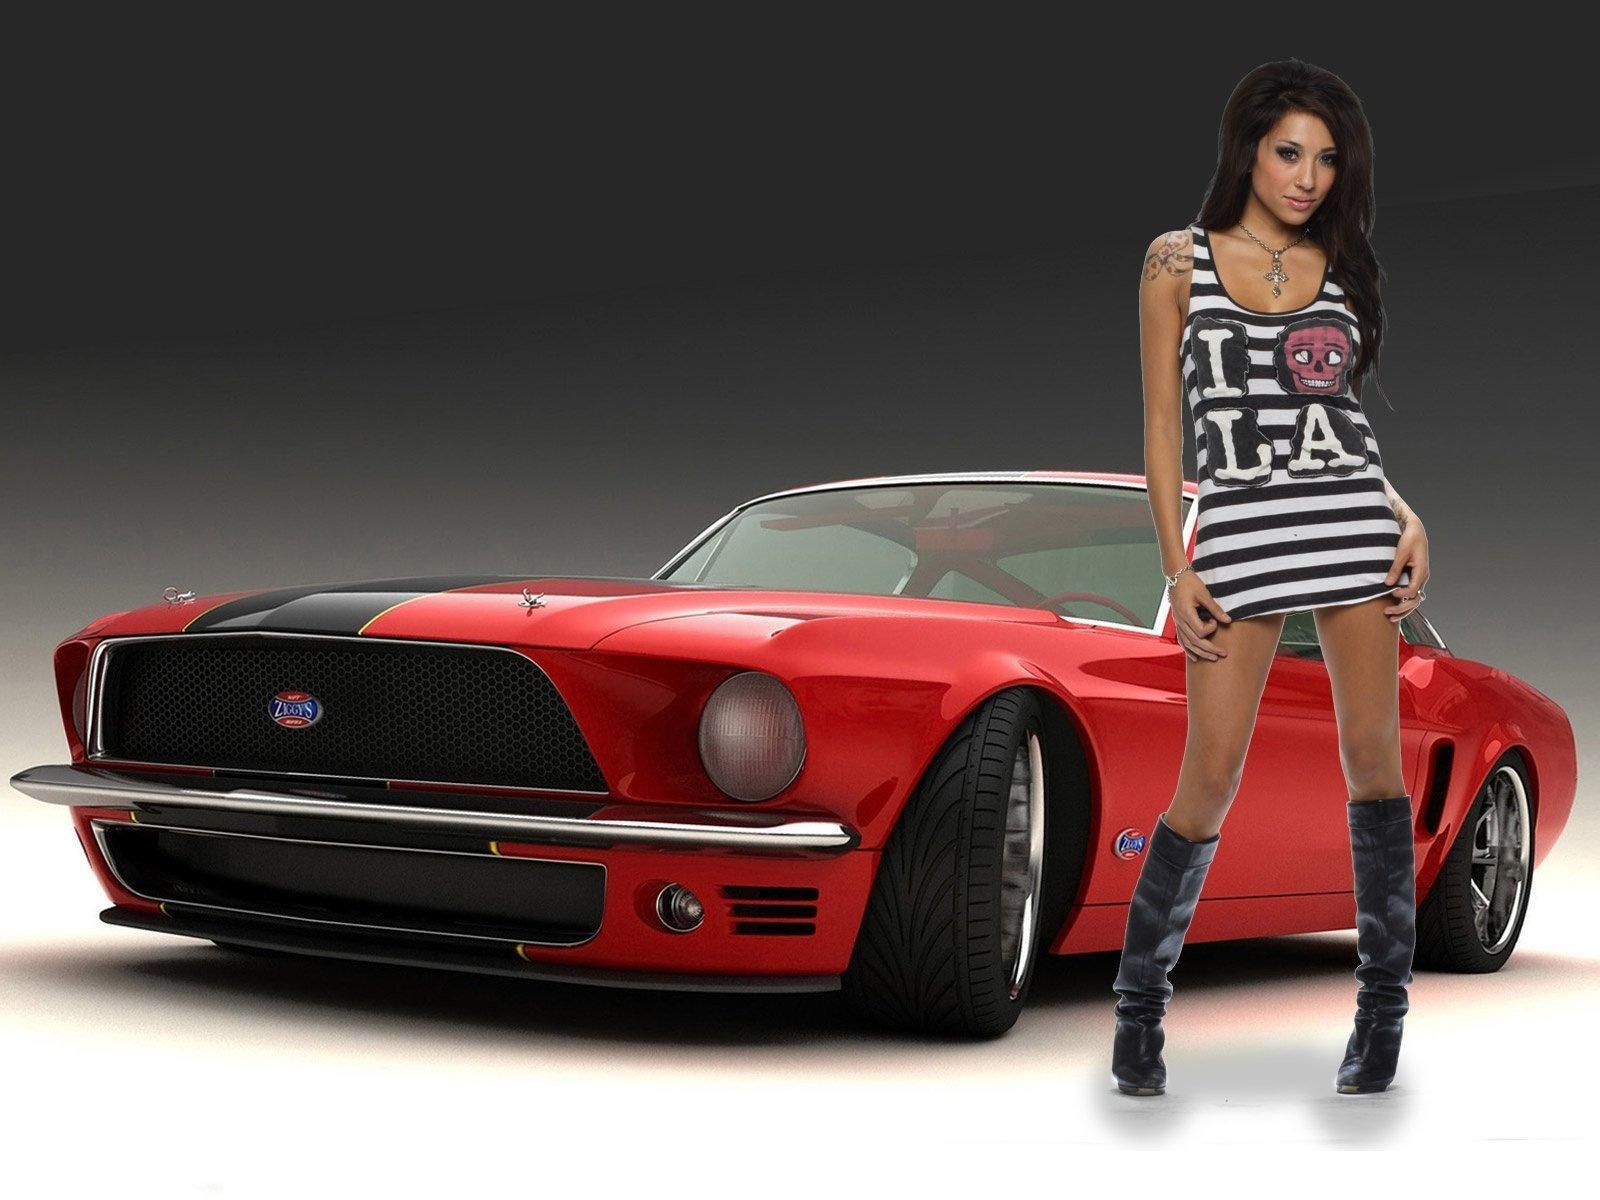 Download Full Size Mustang Girls Cars Wallpaper 1600x1200 1600x1200